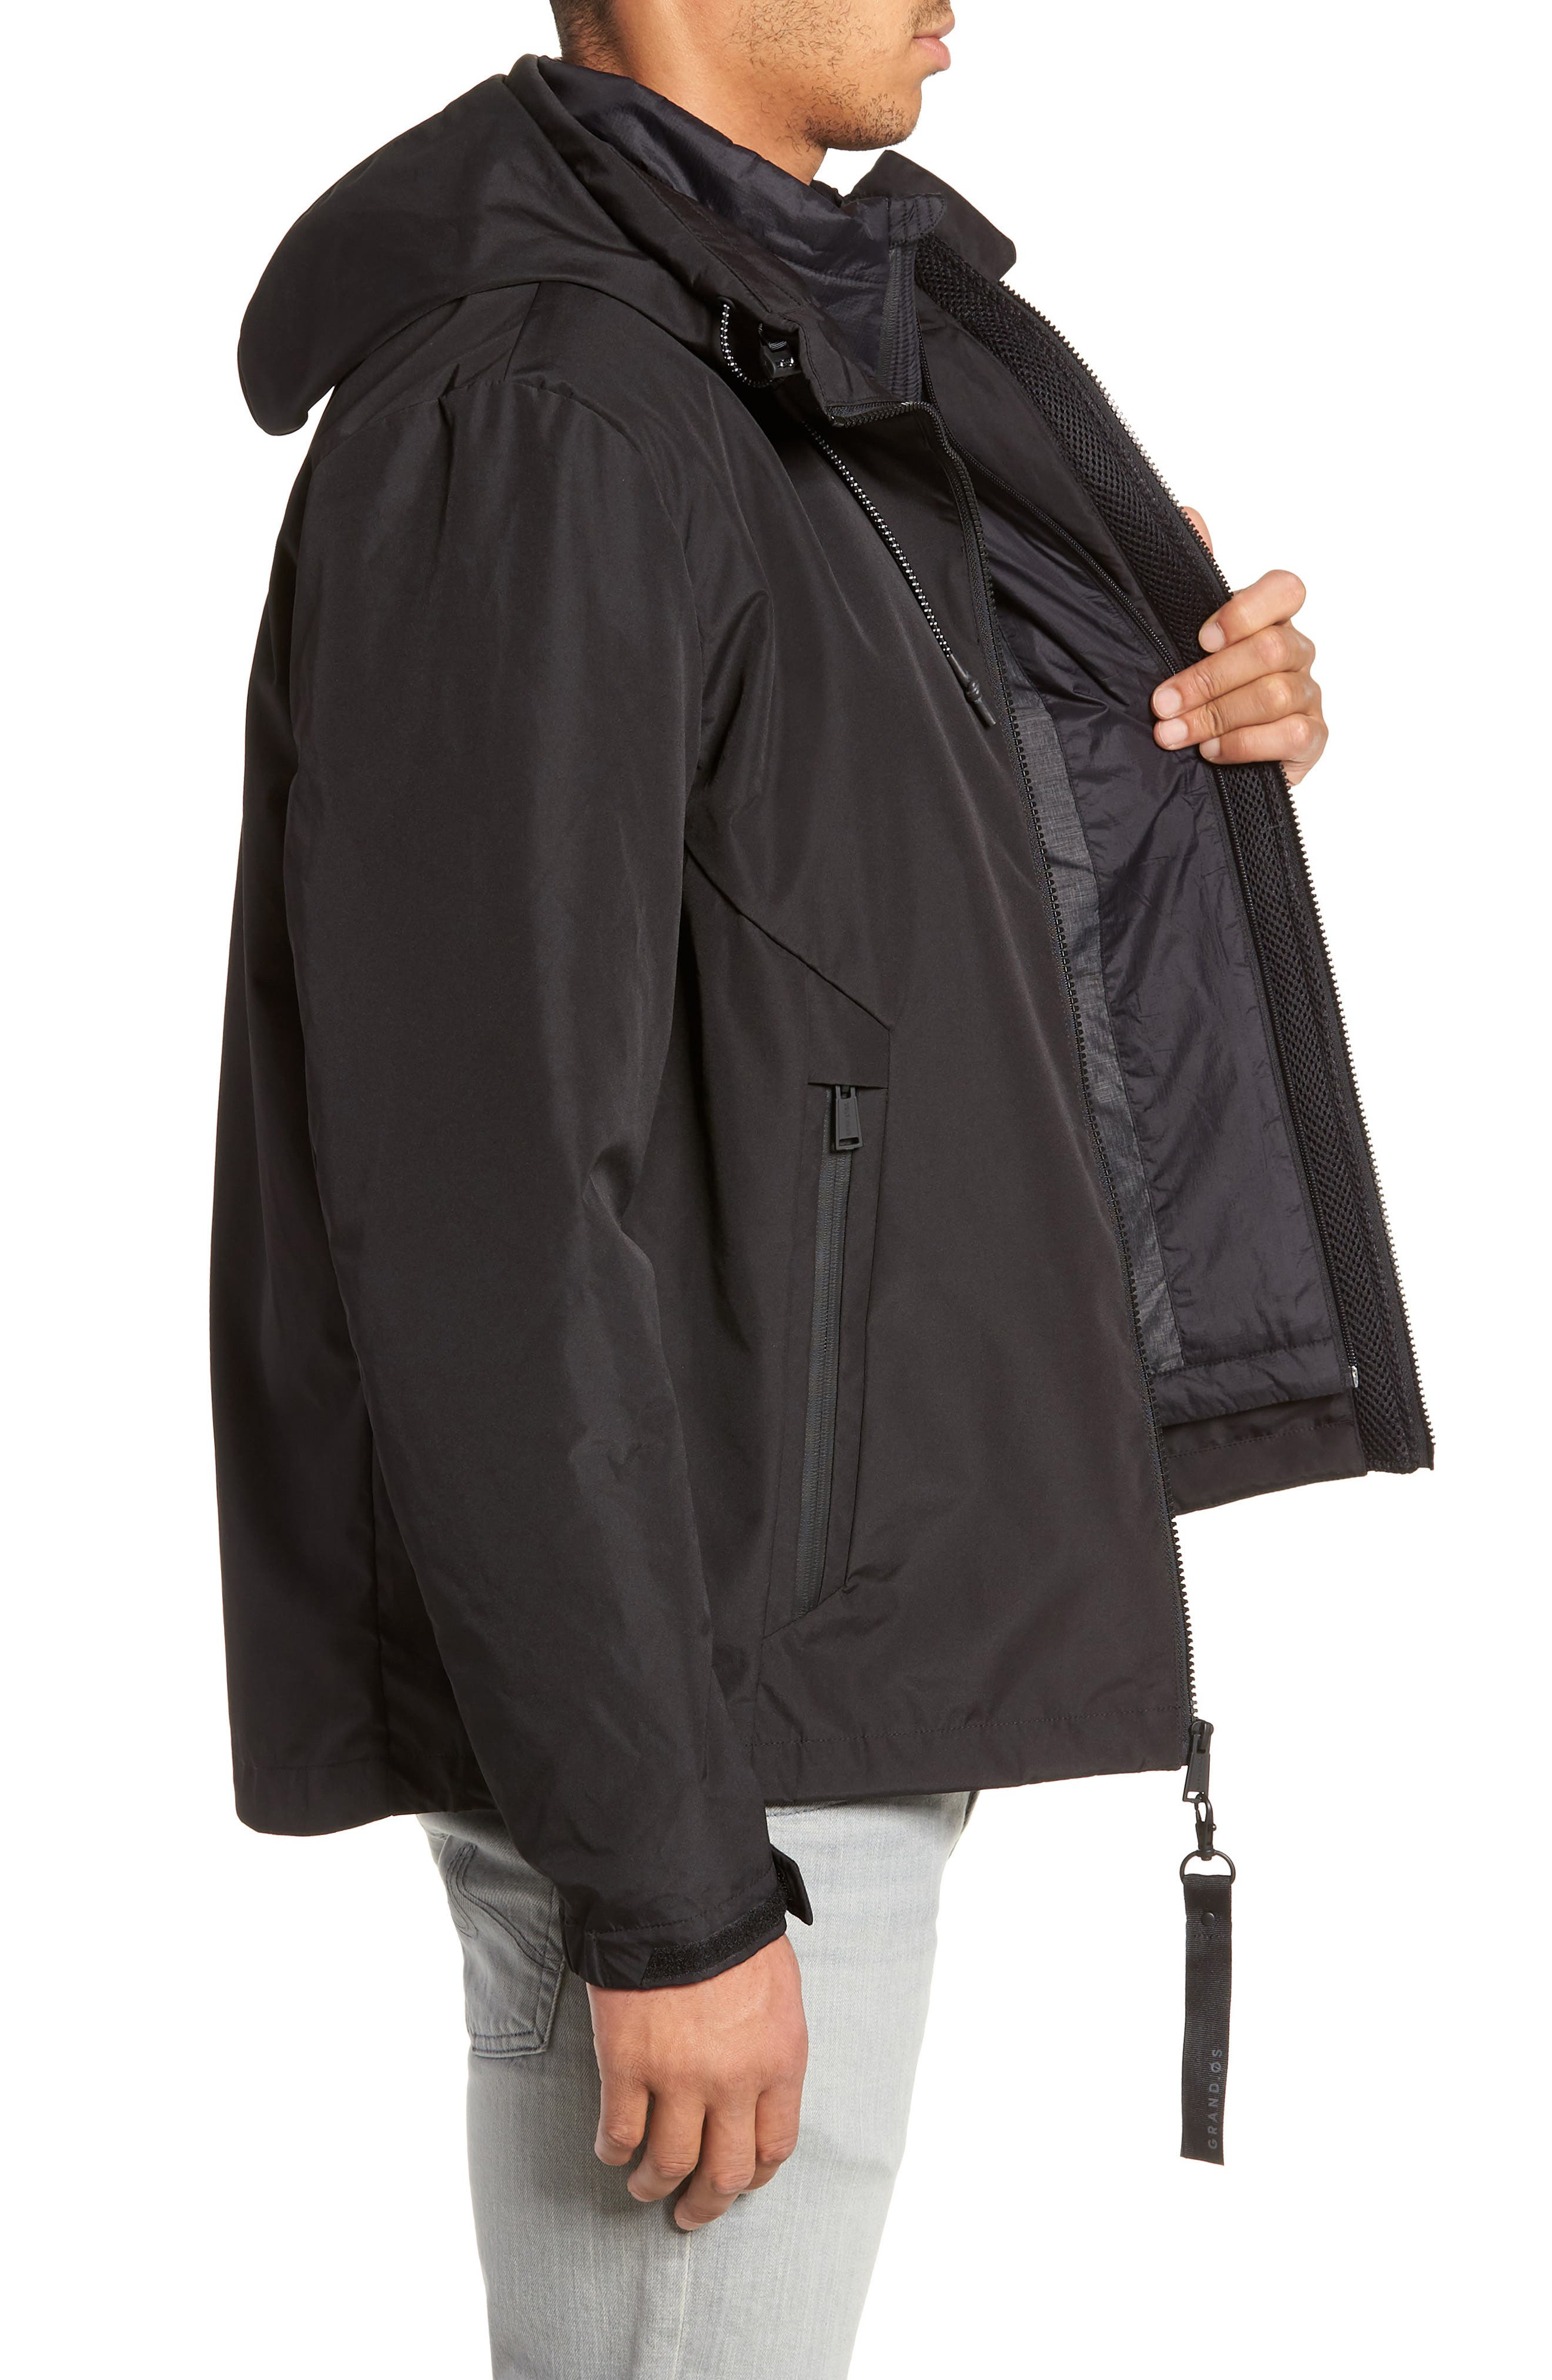 3-in-1 Rain Jacket,                             Alternate thumbnail 4, color,                             BLACK